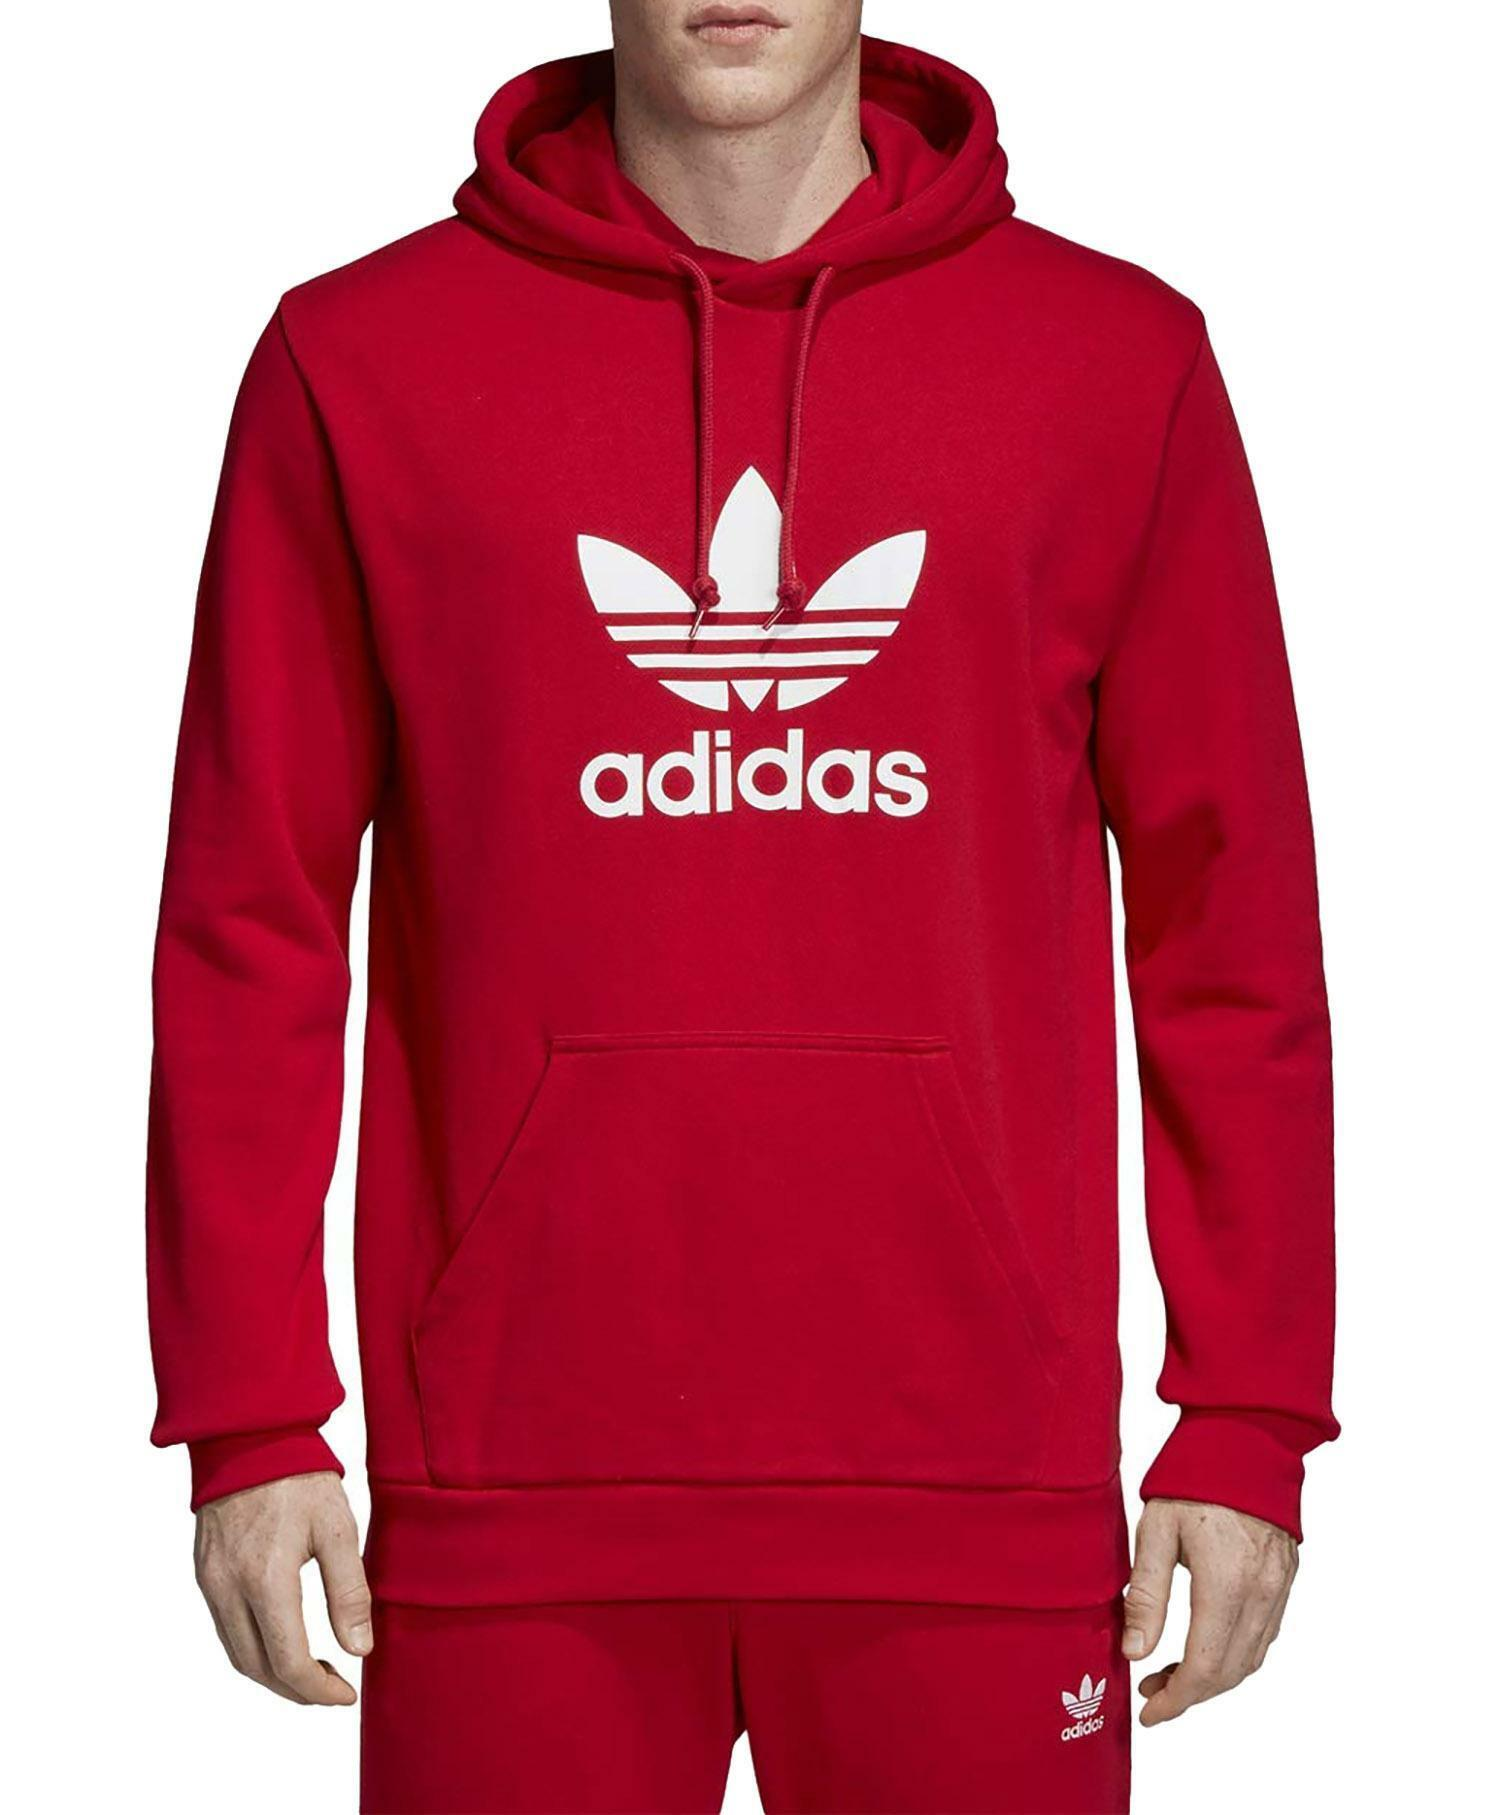 adidas trefoil hoodie felpa uomo